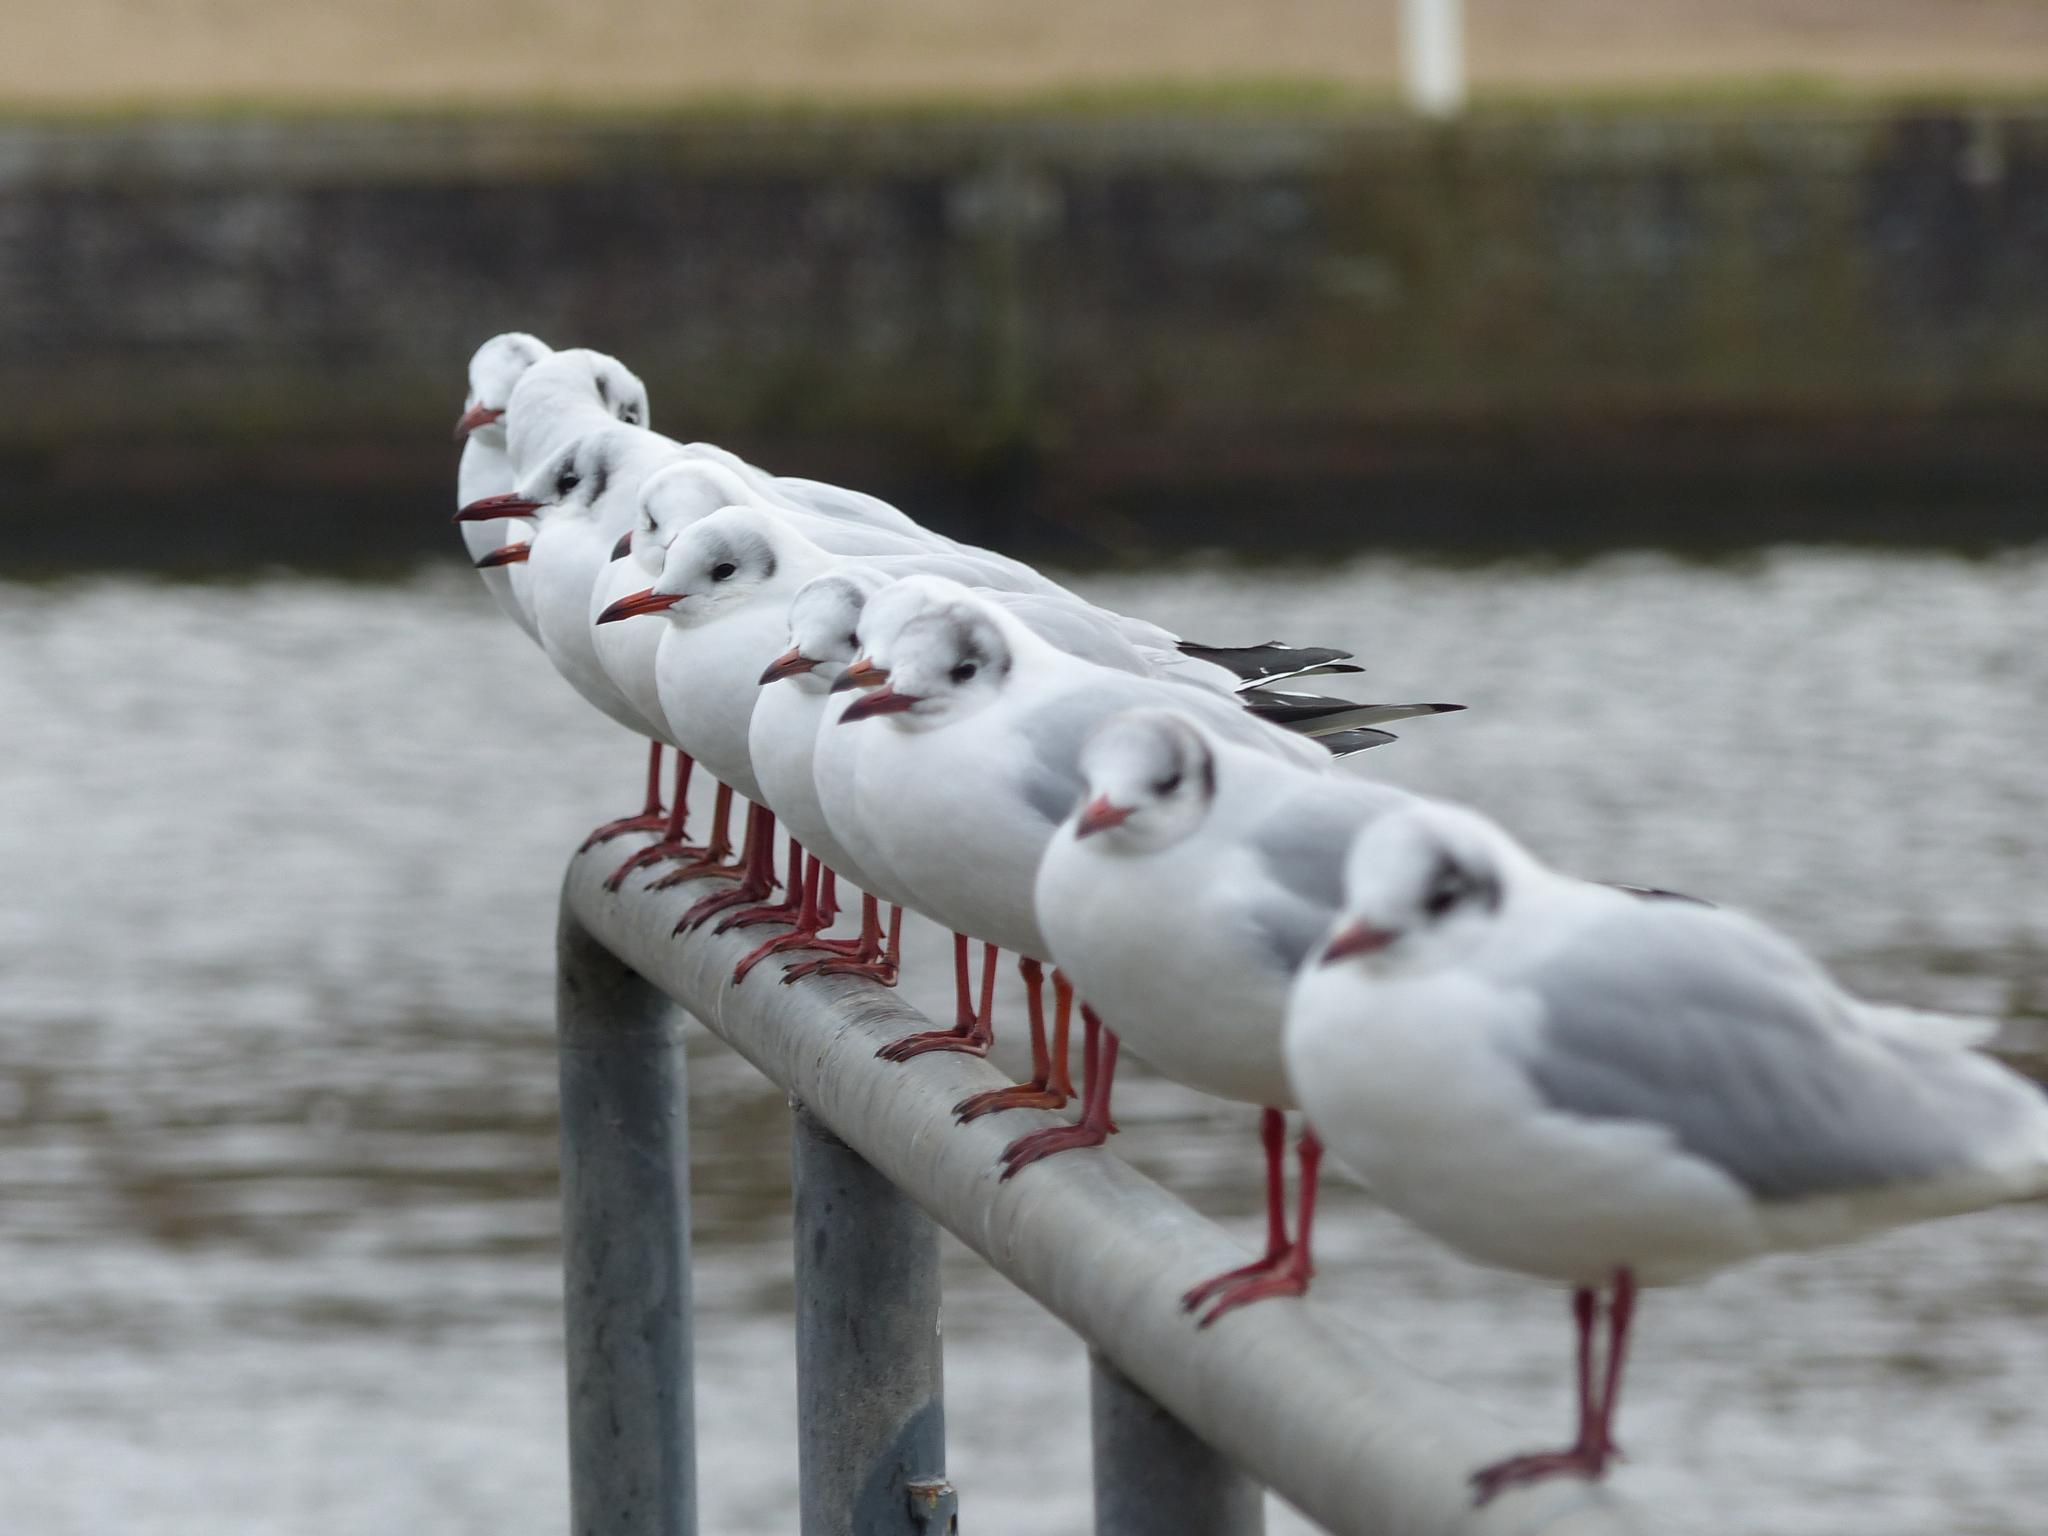 Lübecker seagulls by Lars M.